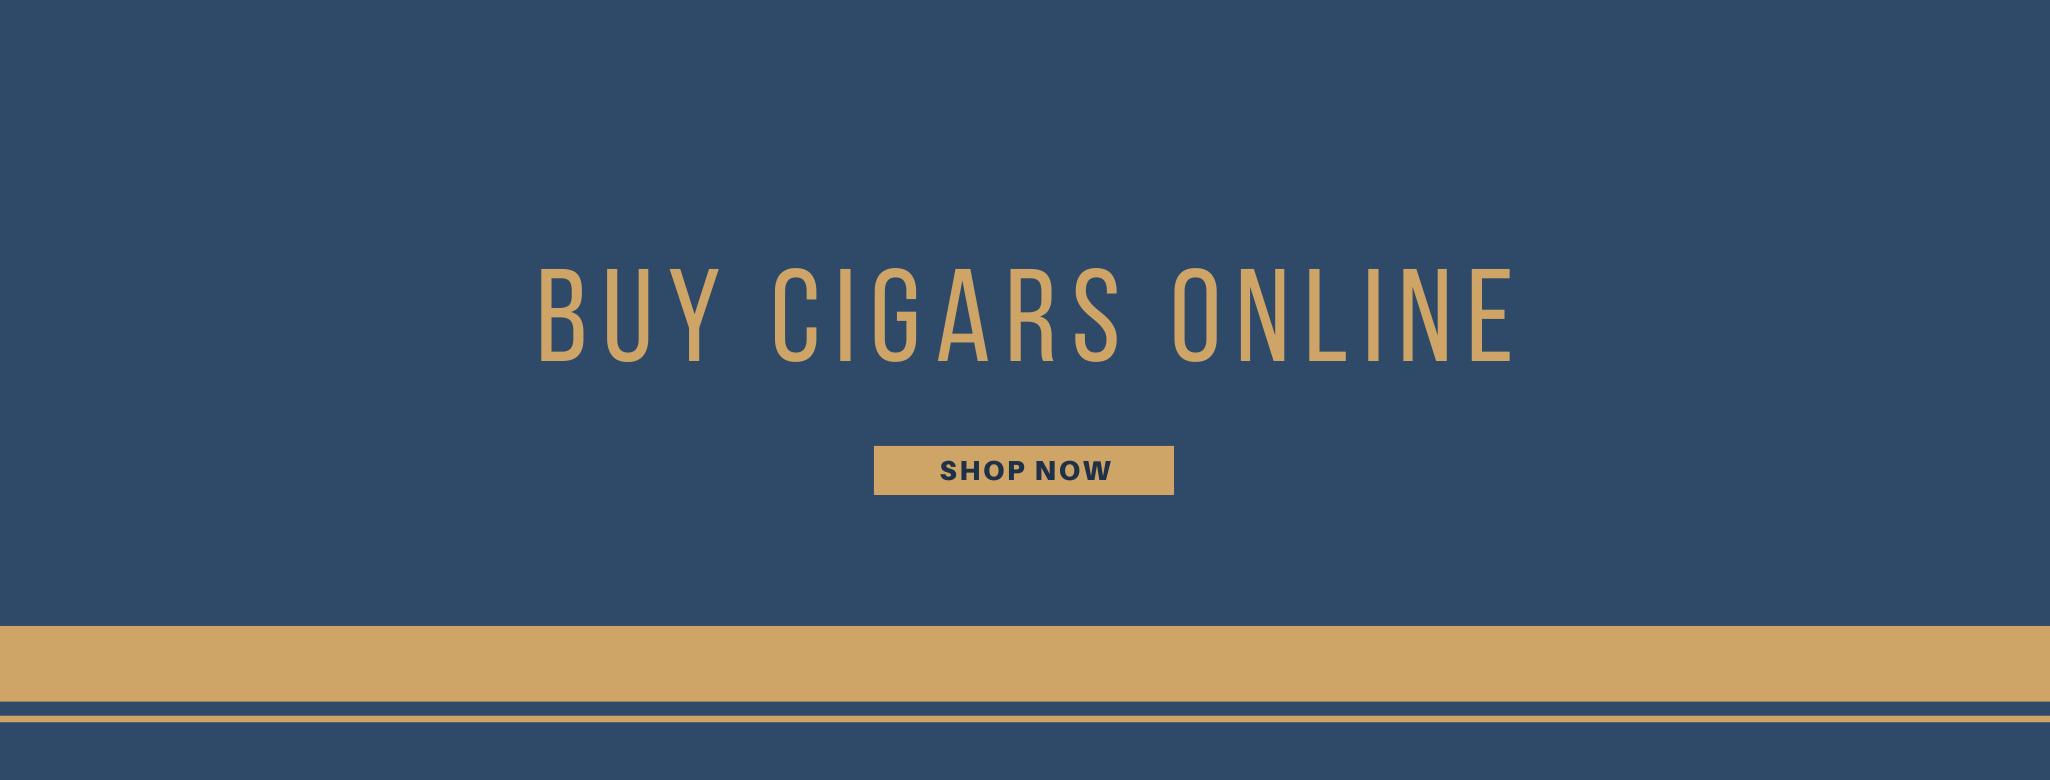 Buy cigars online